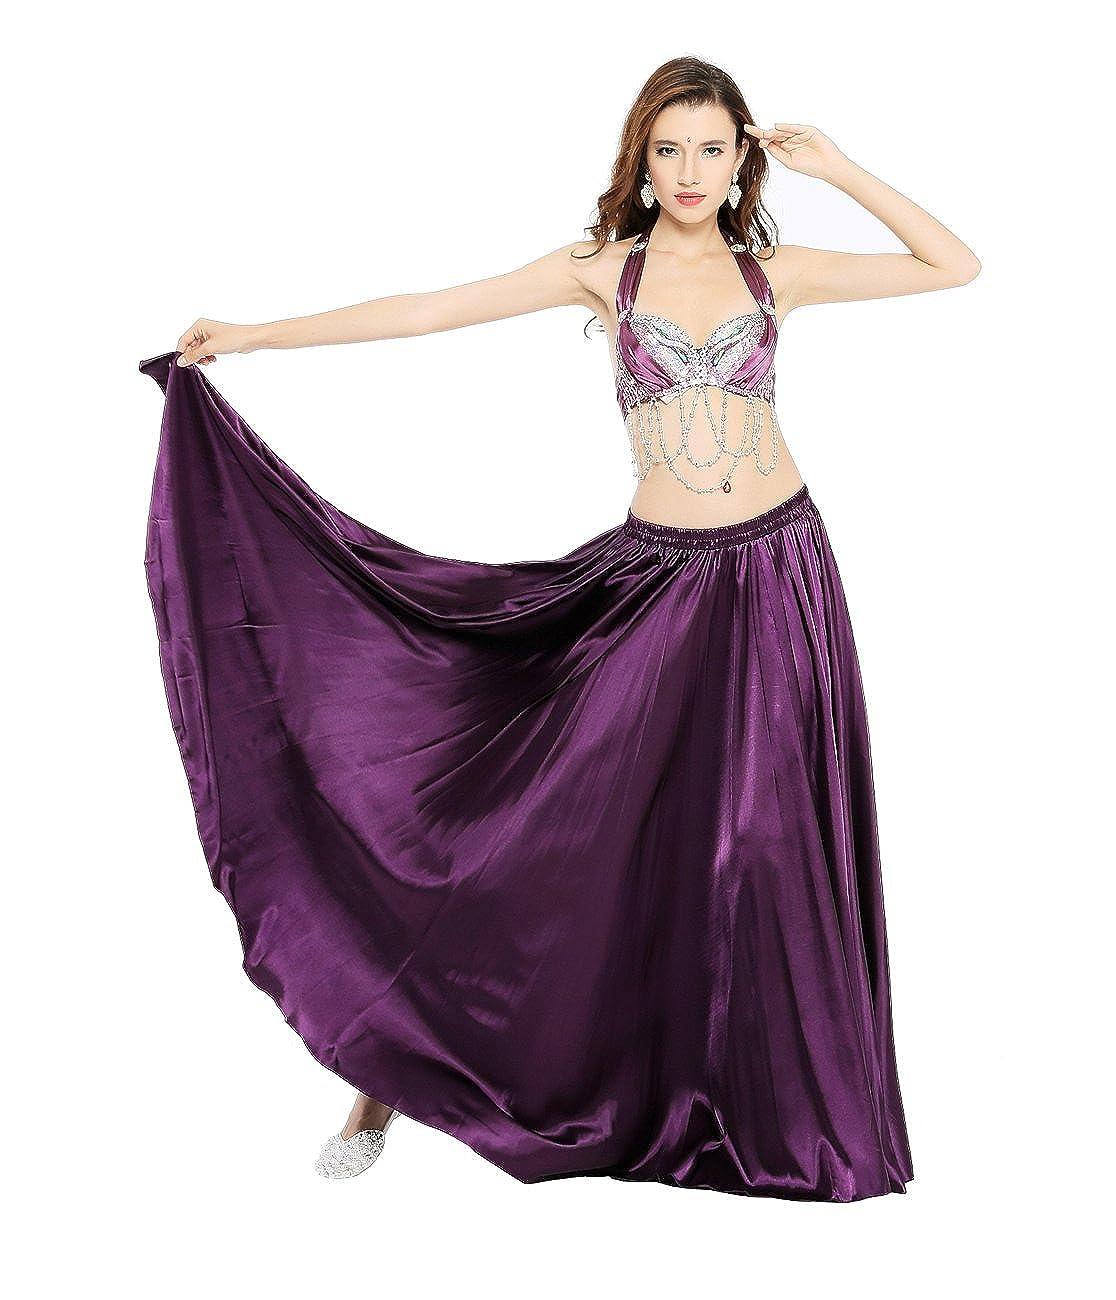 6f7c97bf035 Amazon.com  Dance Fairy Belly Dance Satin Long Skirt